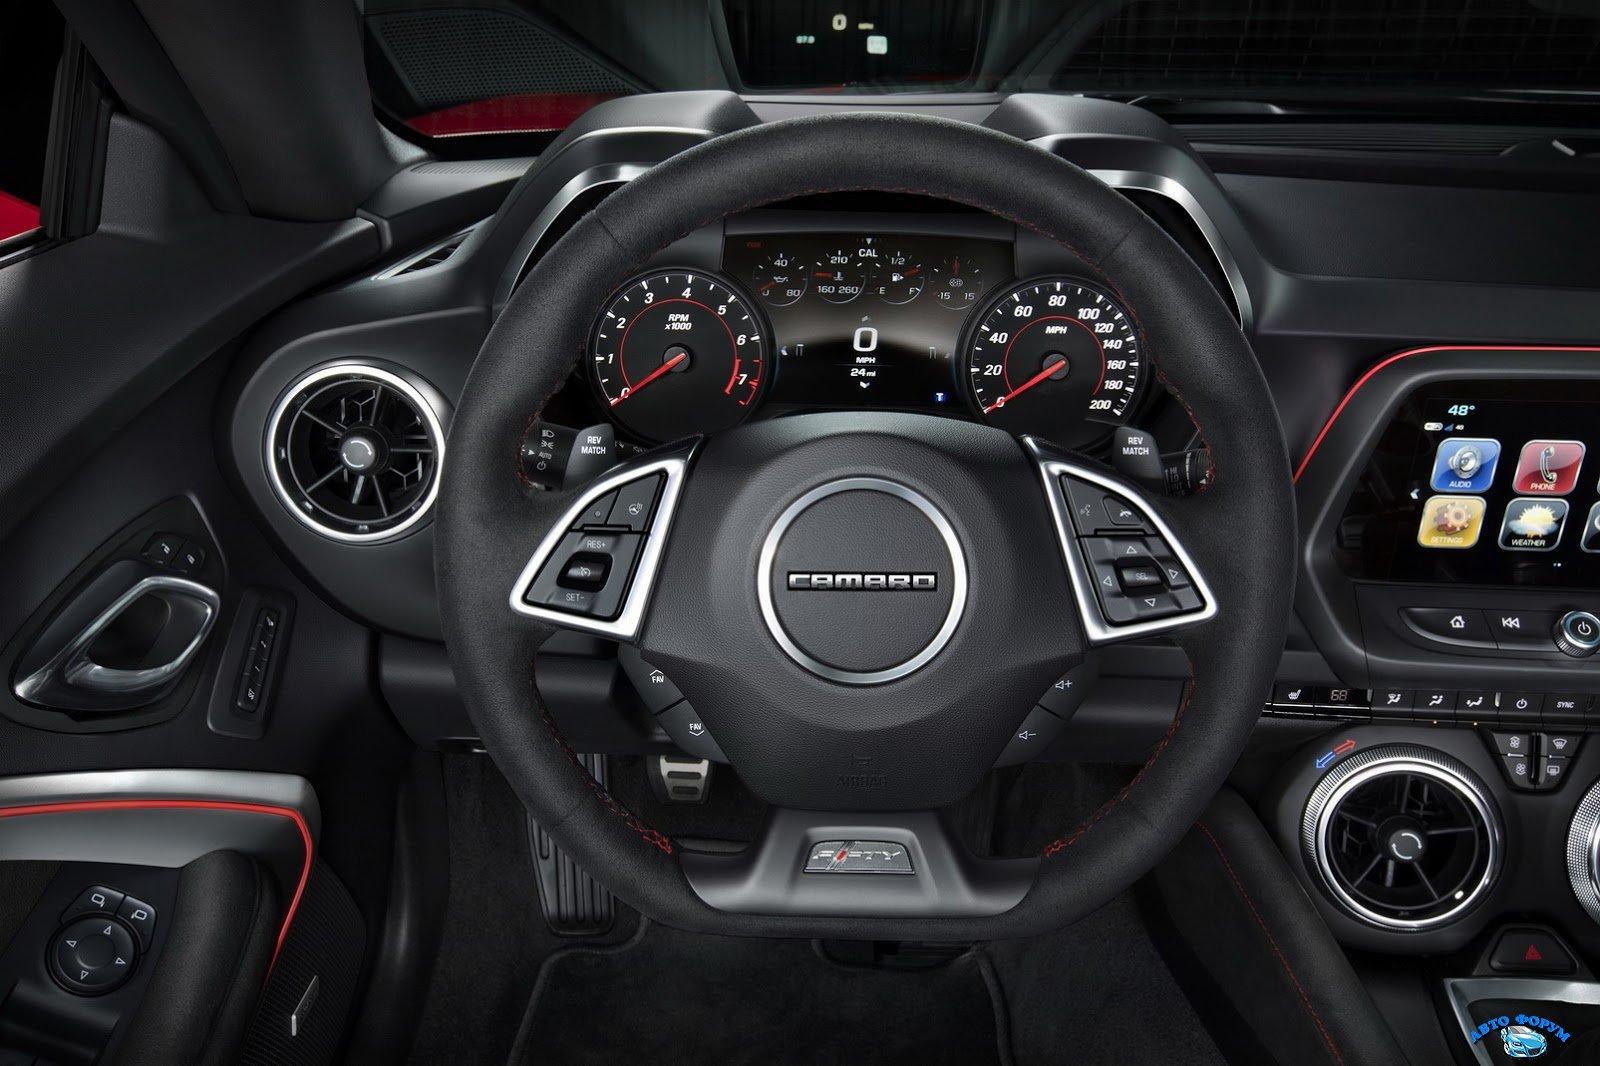 2017-Chevrolet-Camaro-ZL1-7.jpg